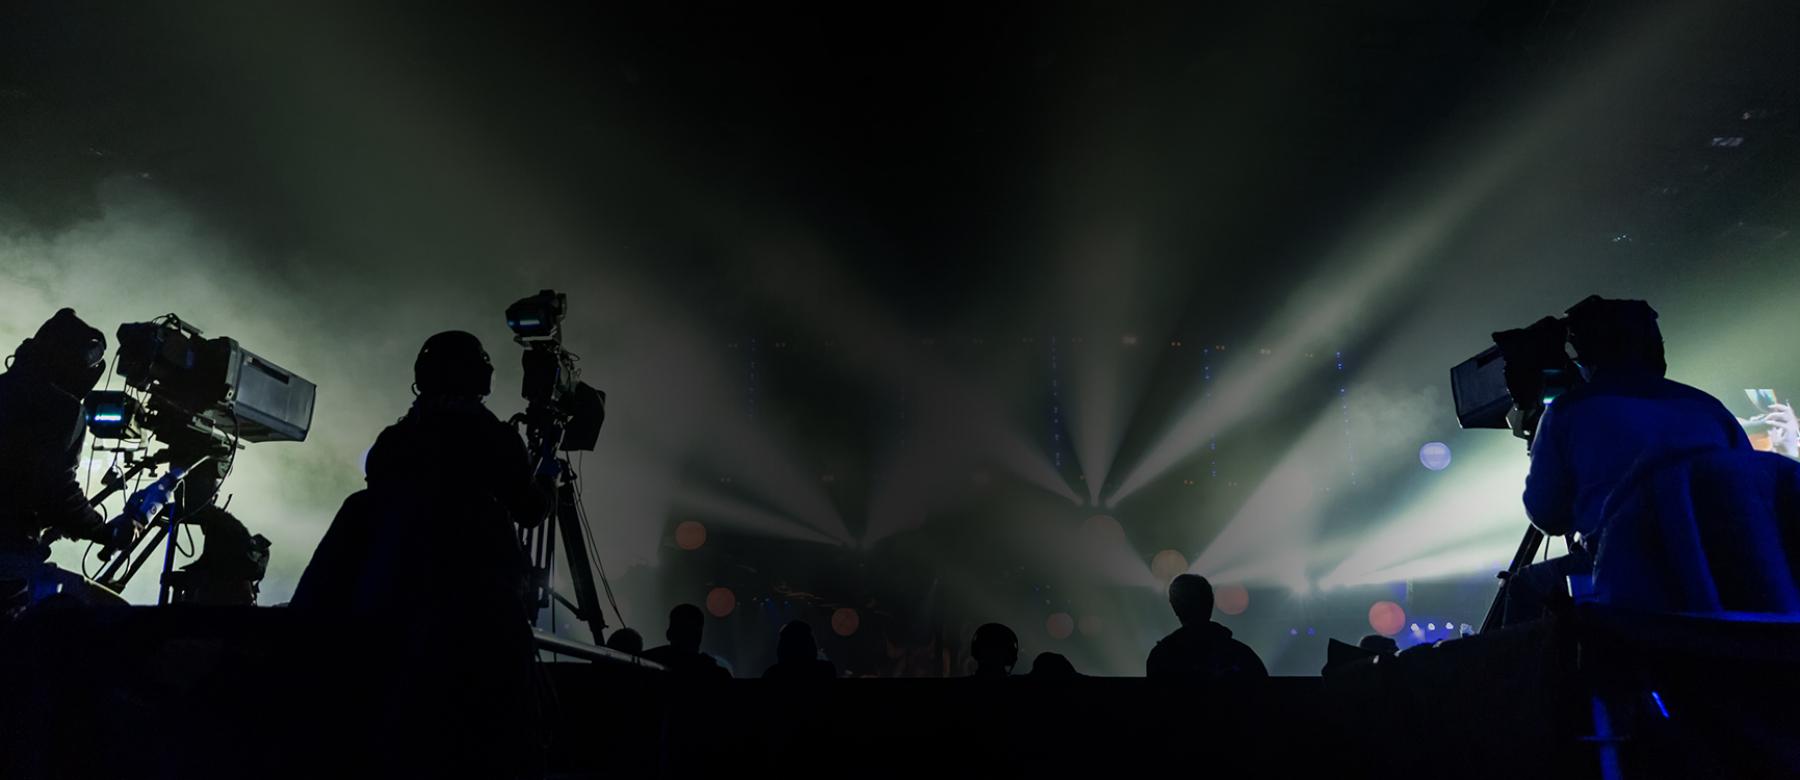 web_banners_1800x750_broadcast_live